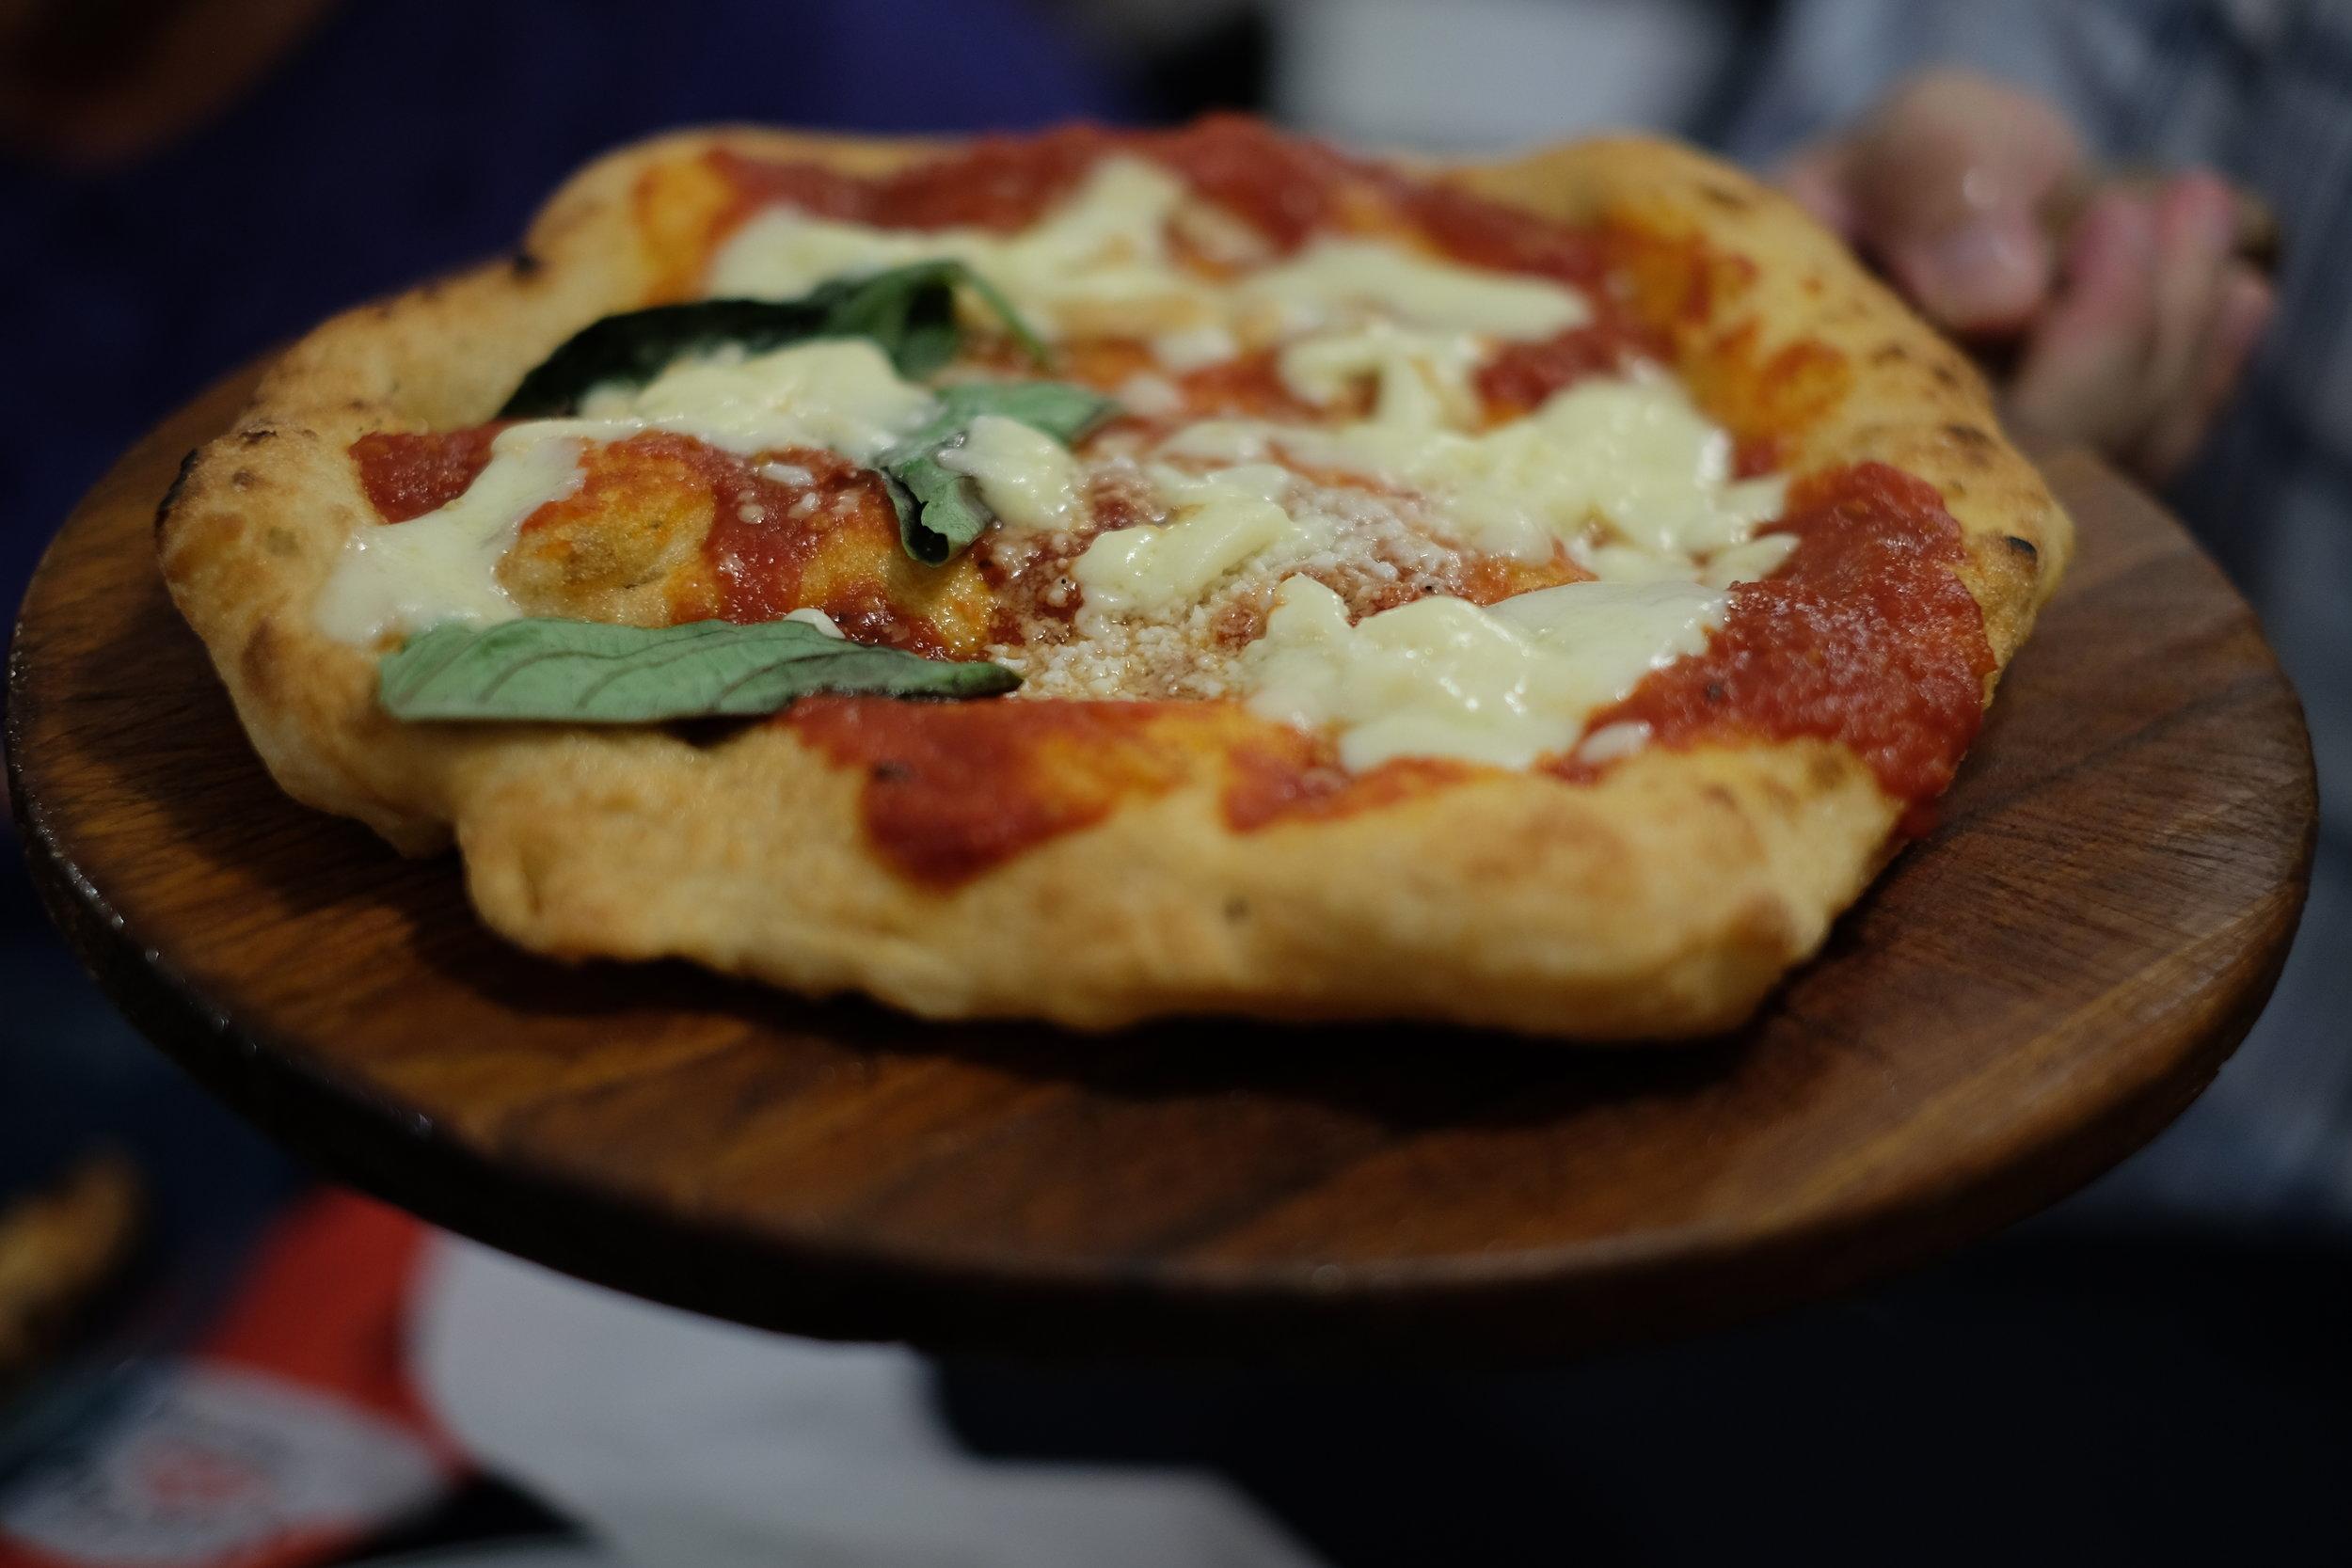 Pizza montanara (pizza fried with tomato sauce, mozzarella an basil) at the pizzeria Starita.